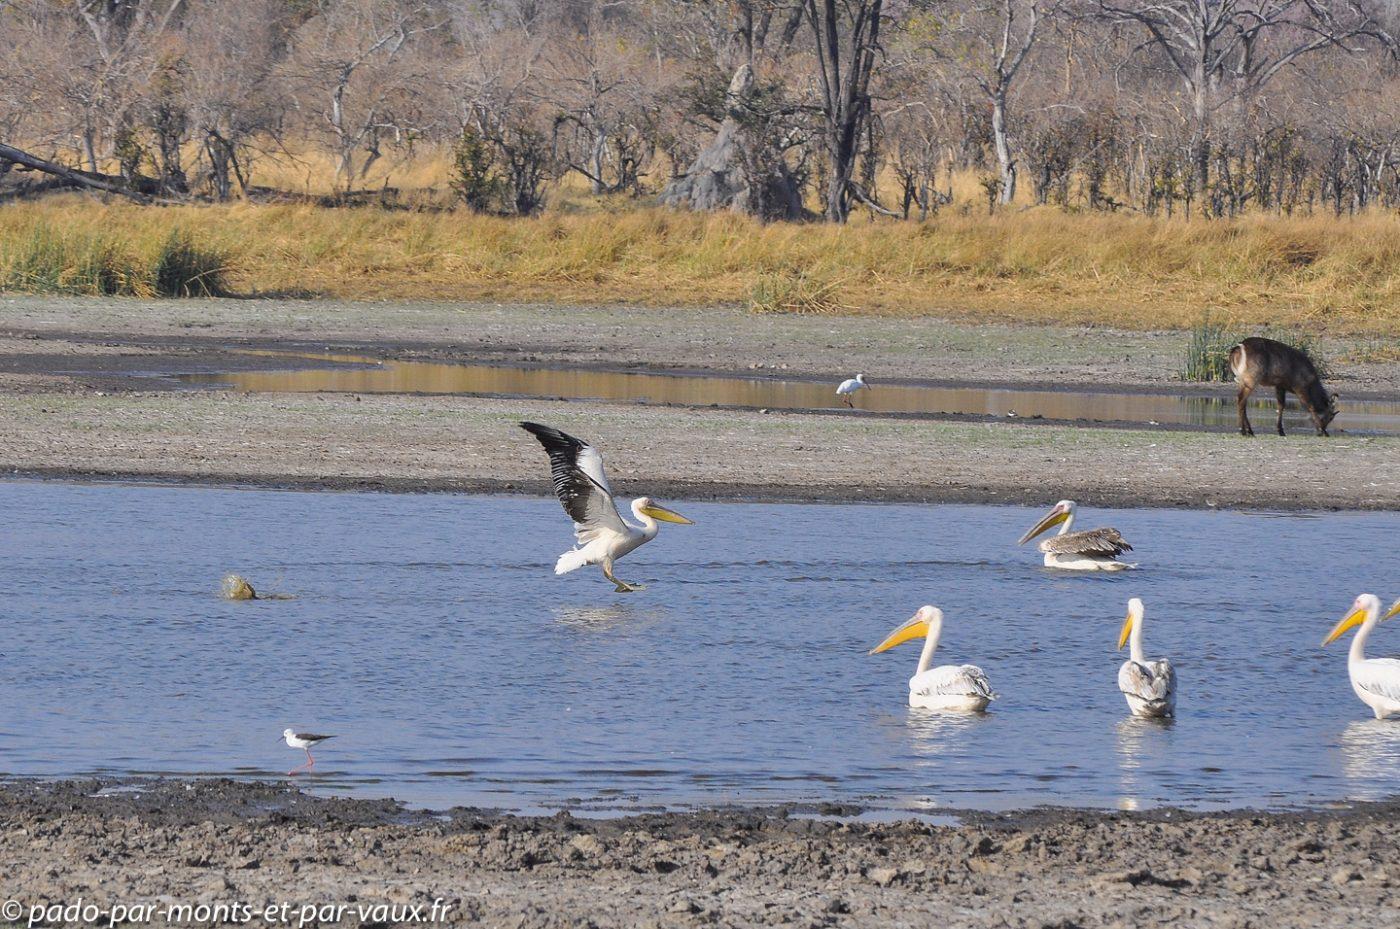 Botswana 2013 - Moremi - Pelicans blancs